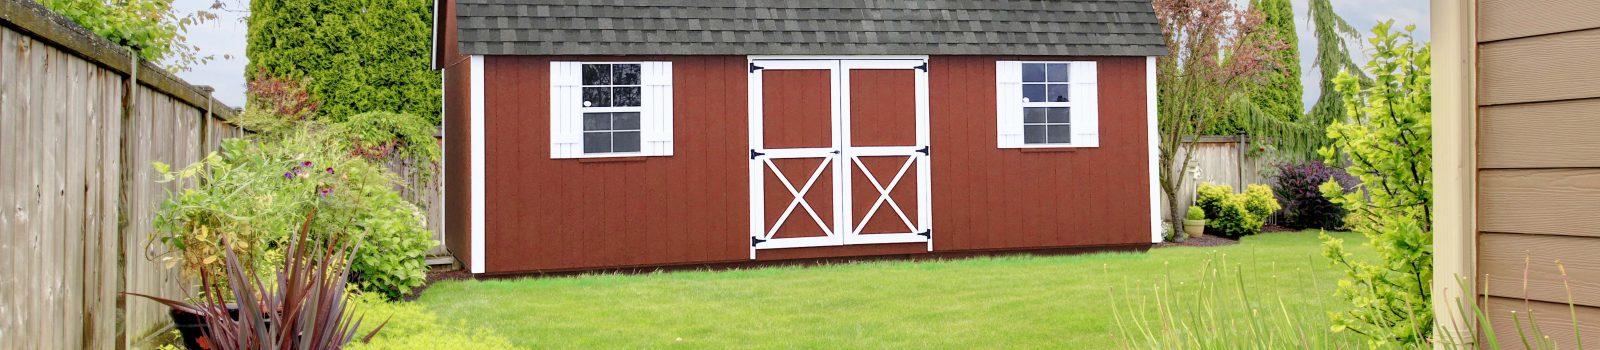 portable storage buildings warner robins ga lofted barn max